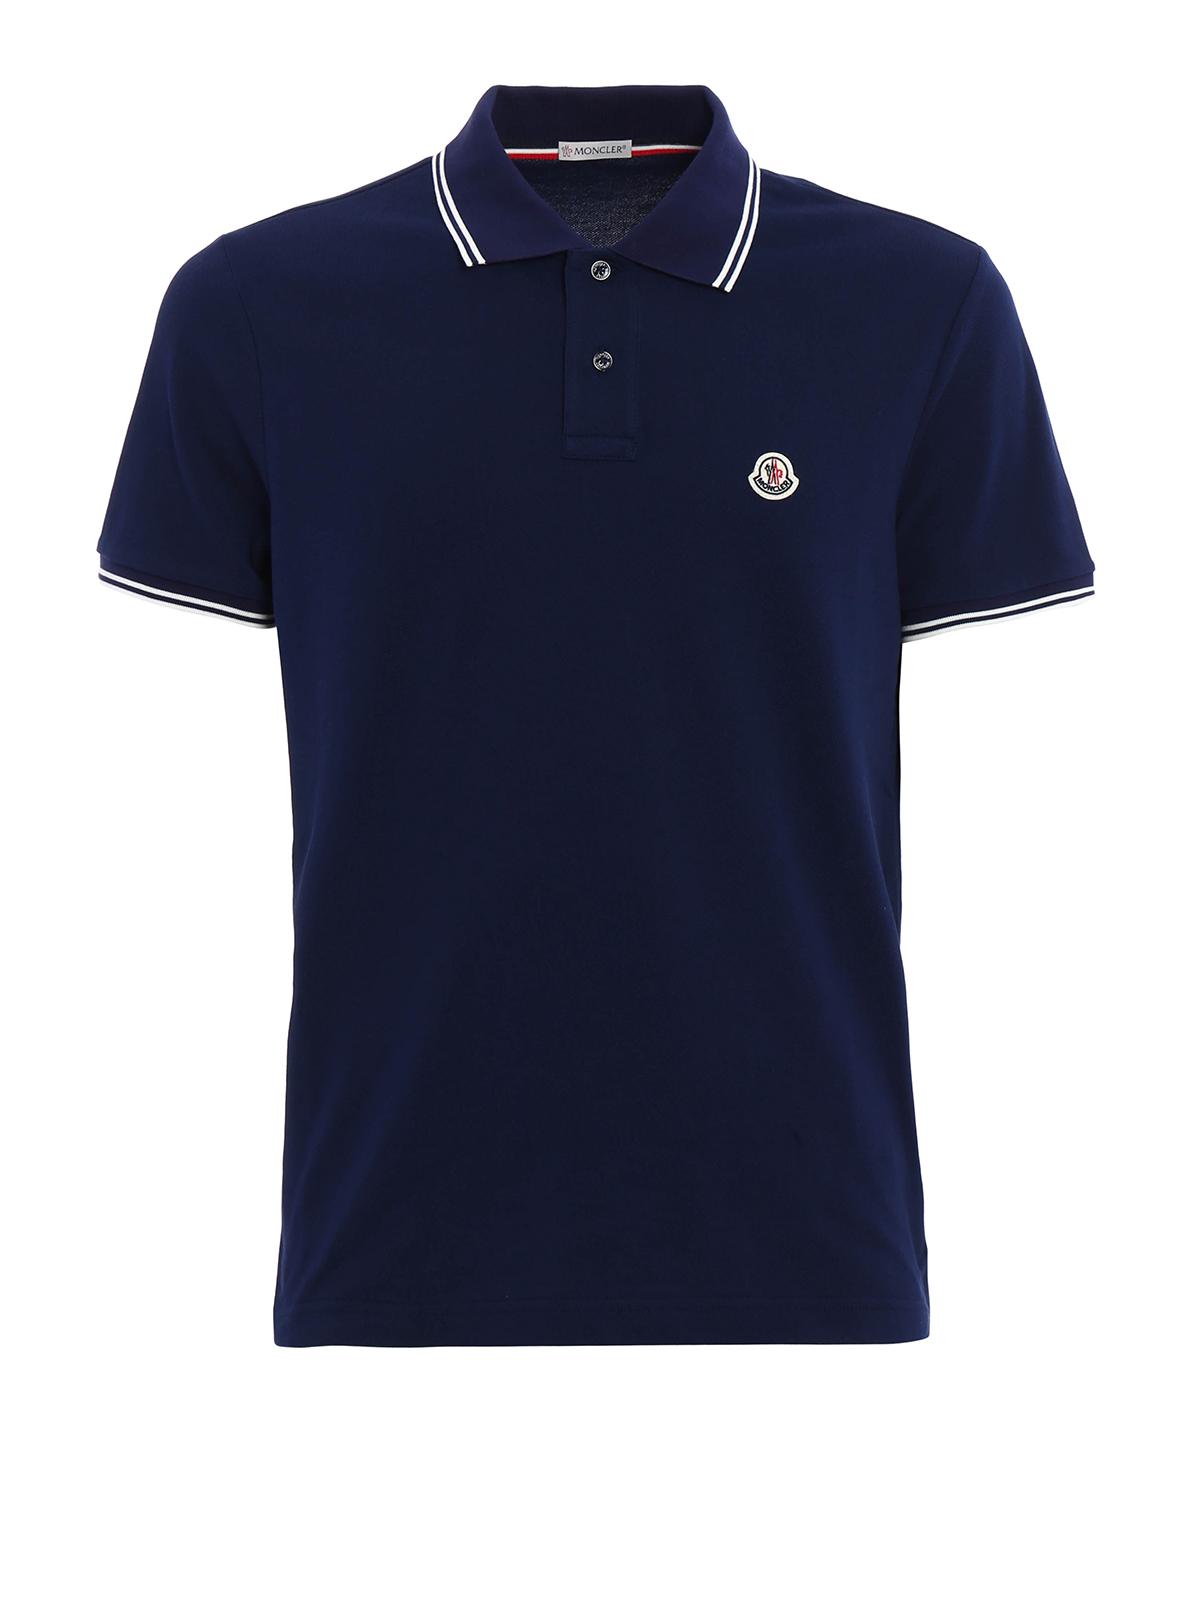 Cotton striped collar polo shirt by moncler polo shirts for Moncler polo shirt sale